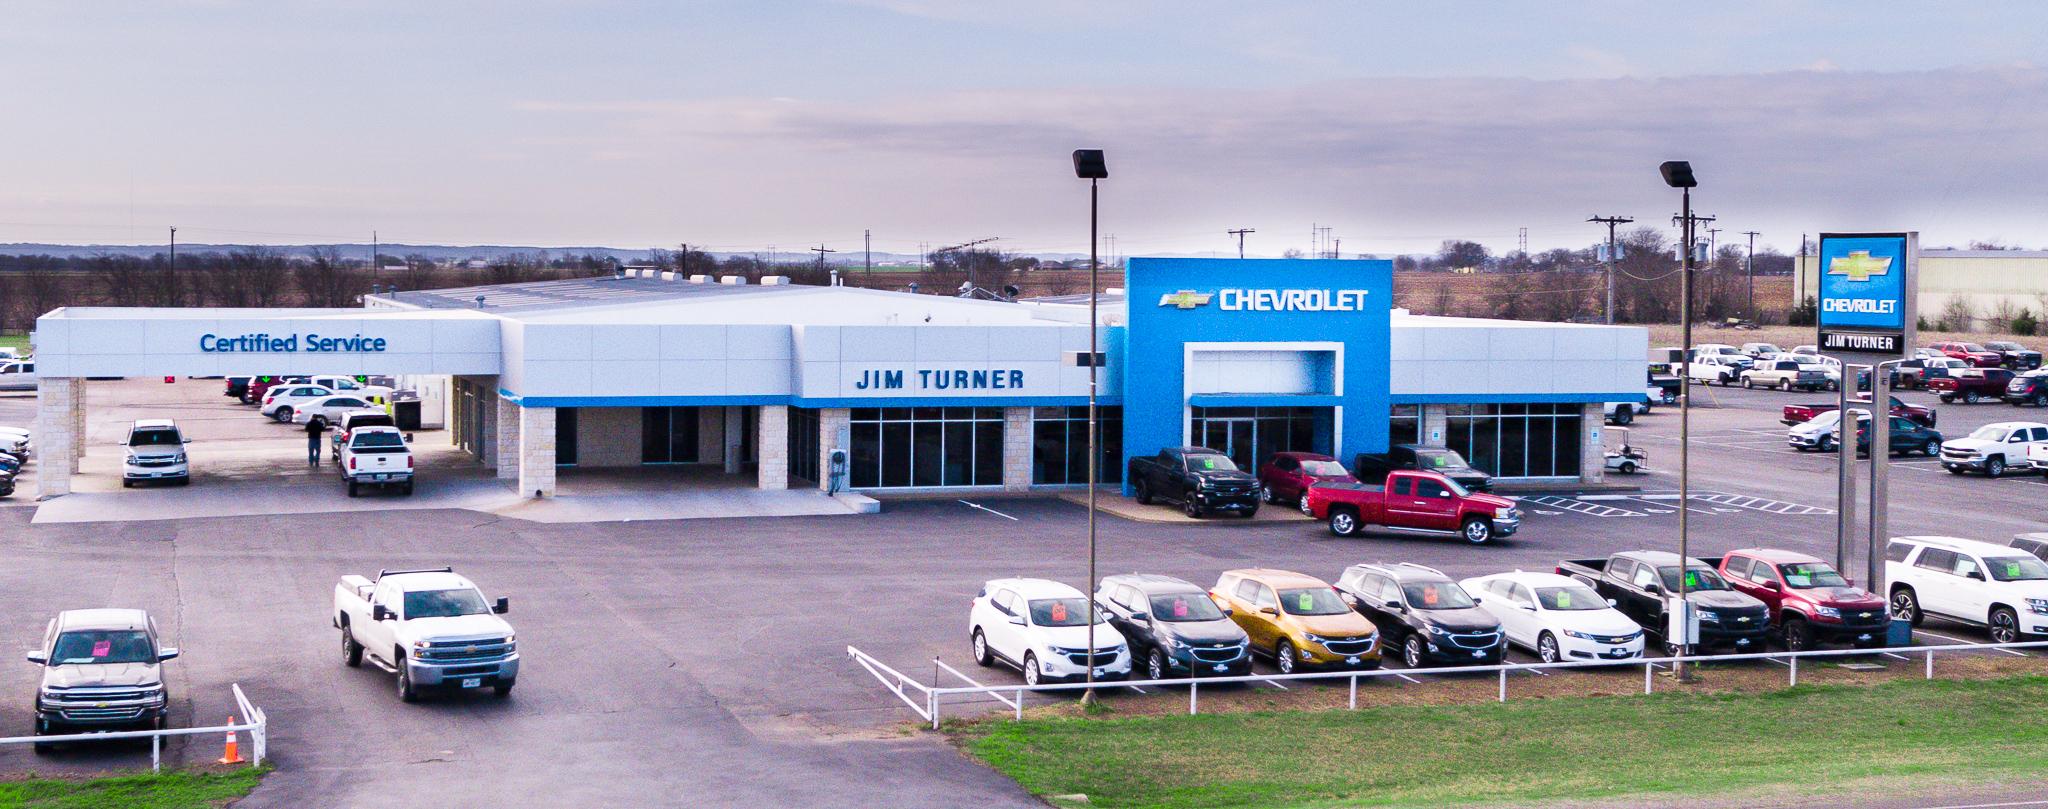 JIM TURNER CHEVROLET  March 2017